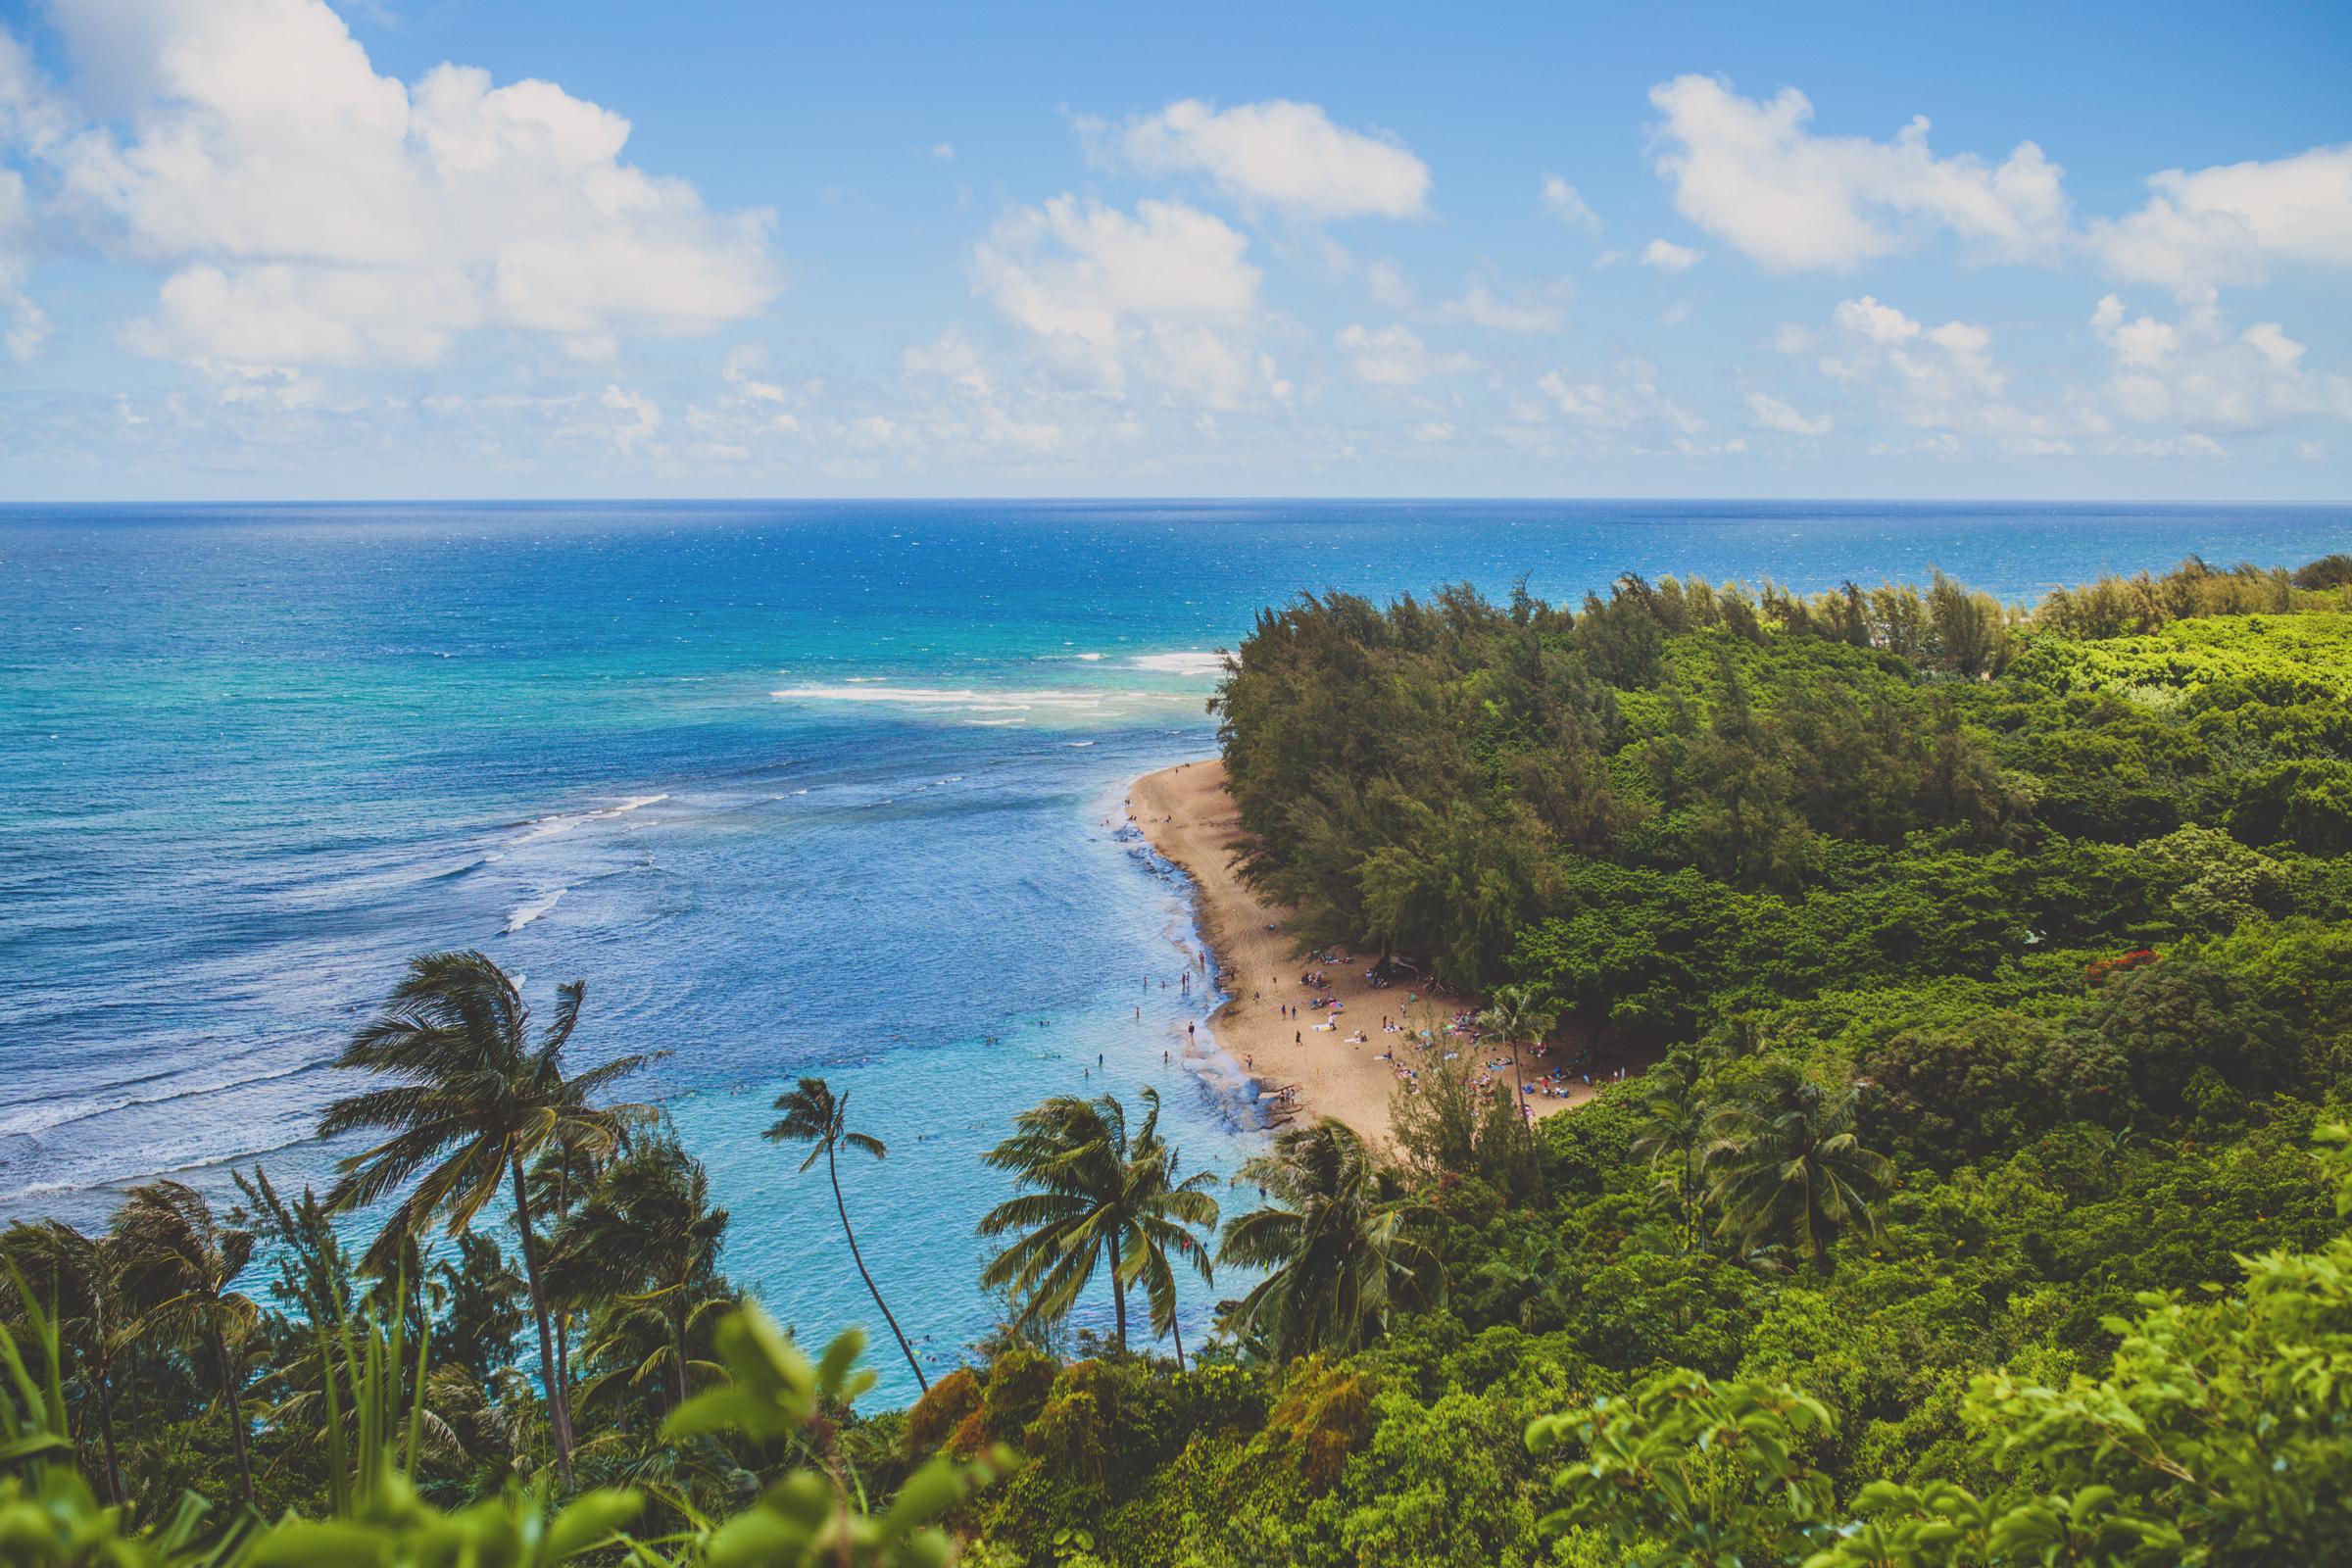 IMG_2556-KAUAI-HAWAII-JENNIFER-PICARD-PHOTOGRAPHY.jpg